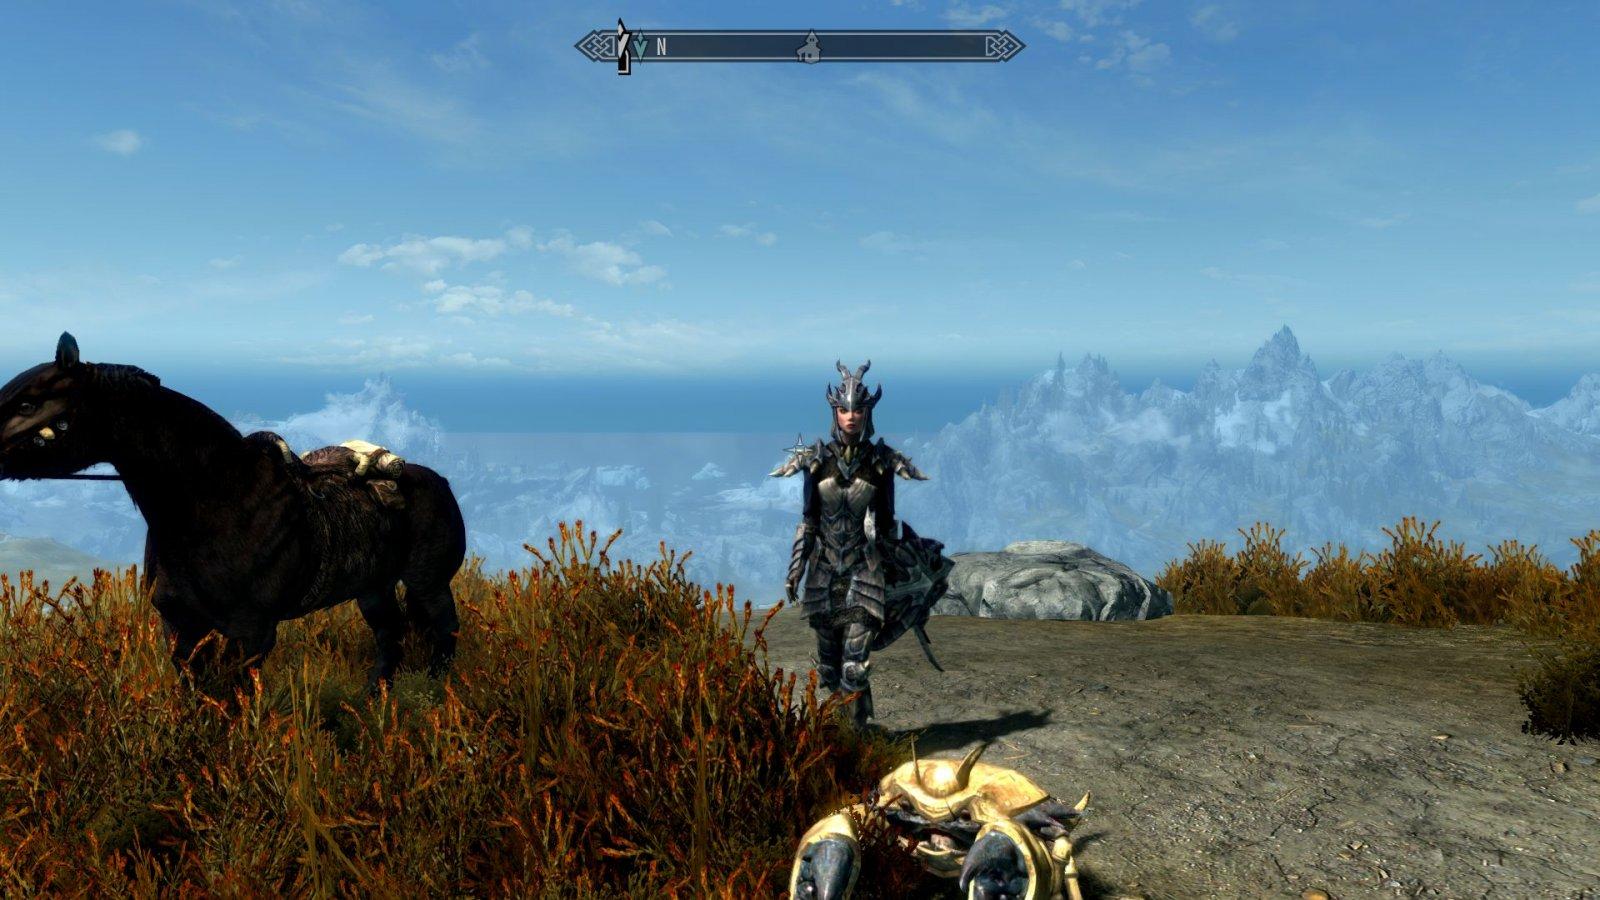 Serana, a horse, and a dwemer mudcrab.